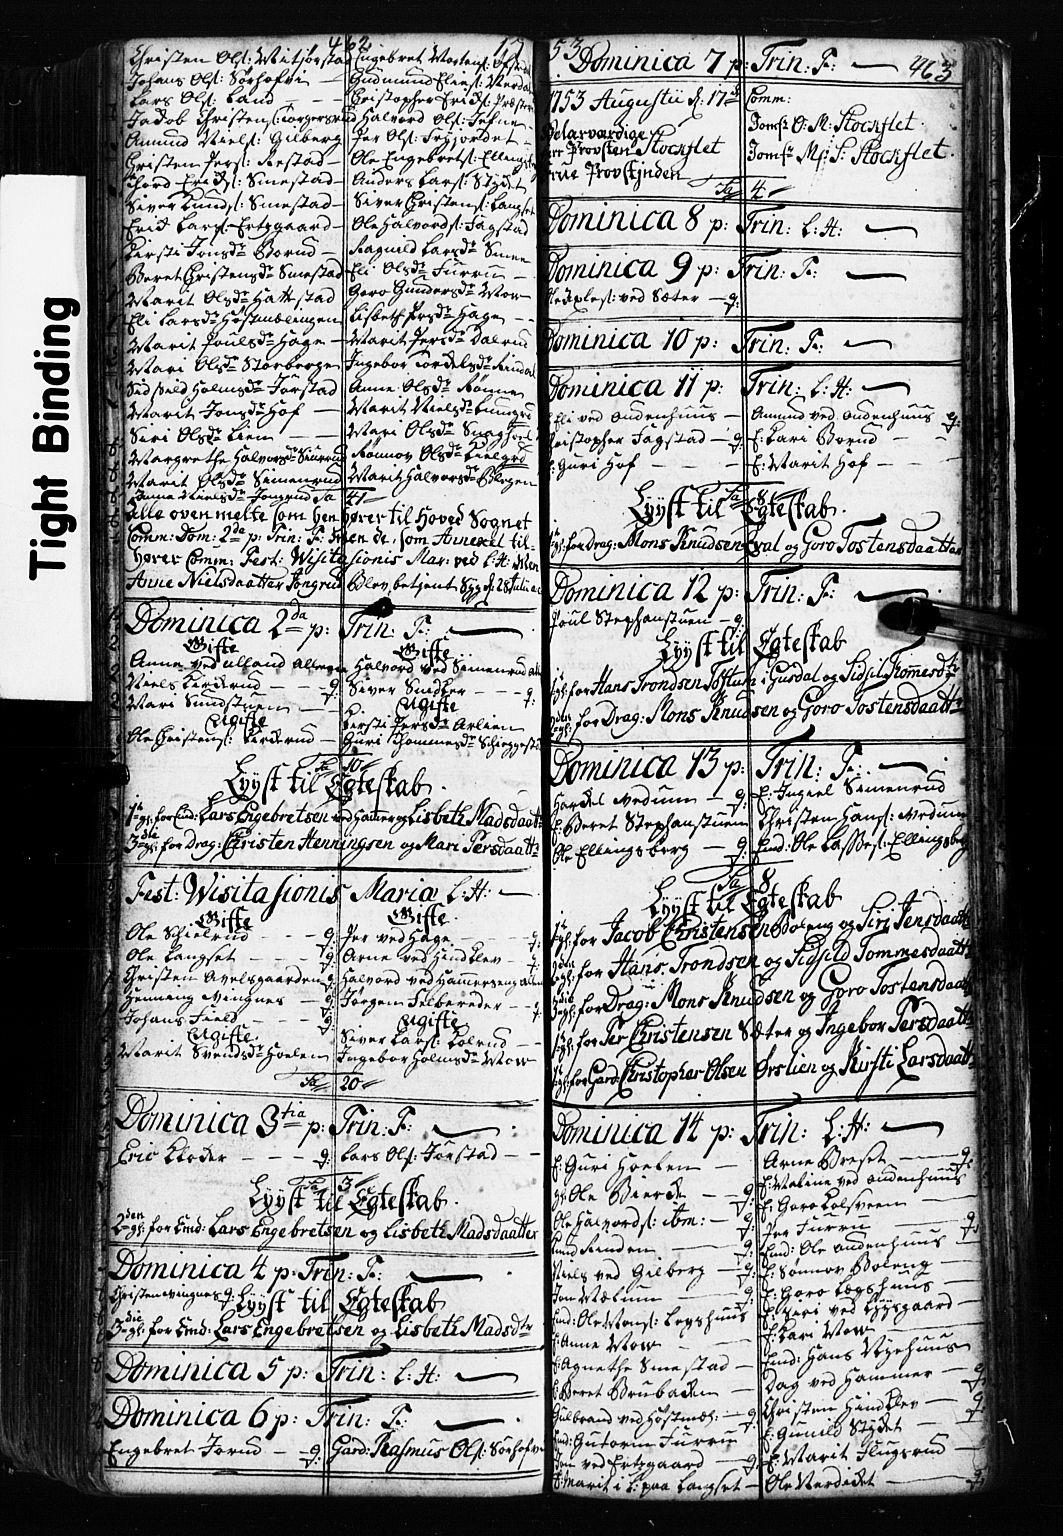 SAH, Fåberg prestekontor, Klokkerbok nr. 2, 1741-1756, s. 462-463